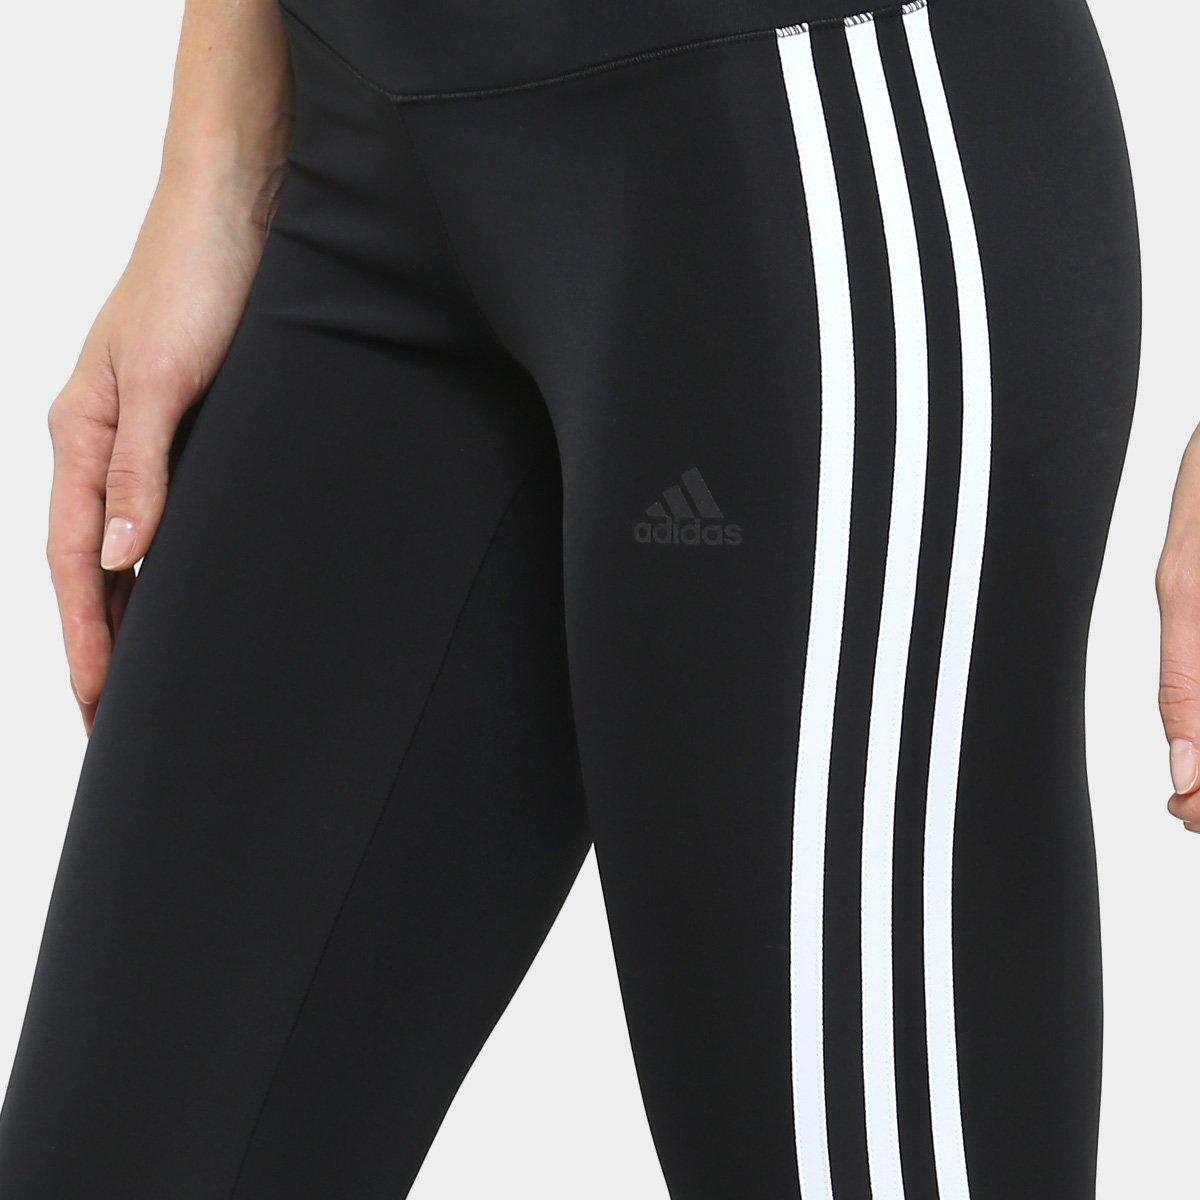 Move Designed Branco Legging Preto e Adidas Feminina 2 Calça nSUwvA1xI